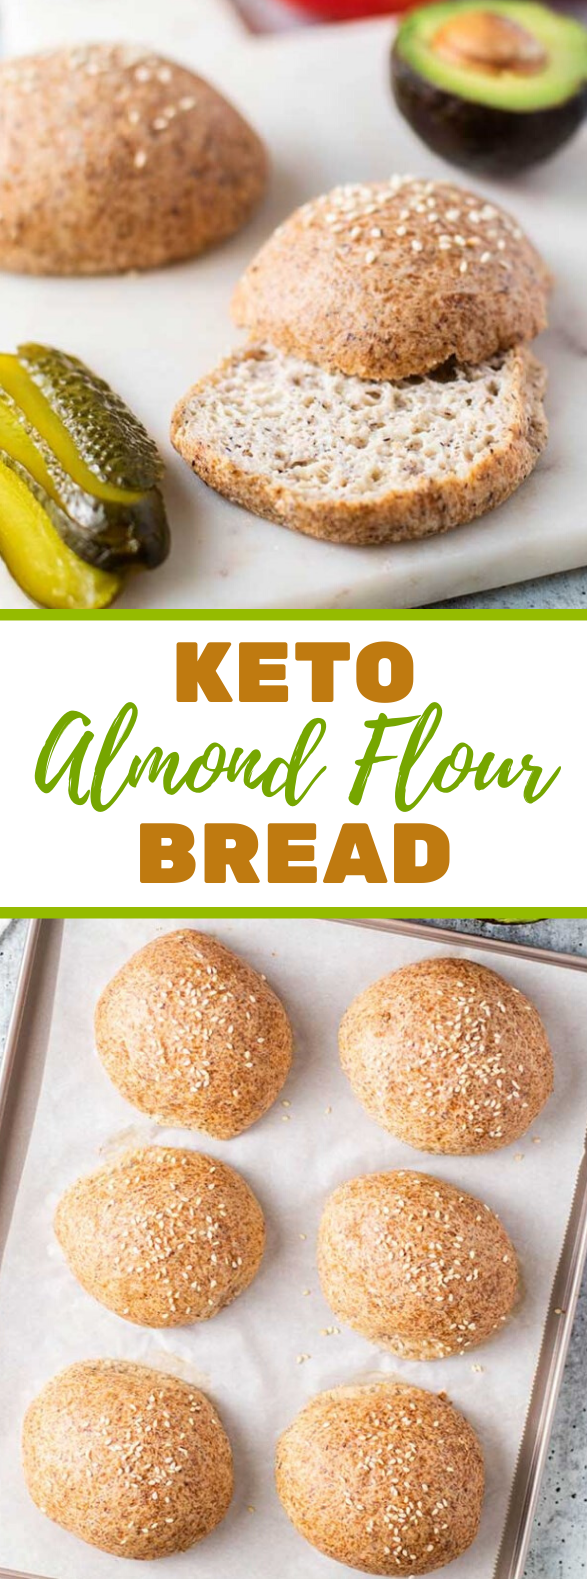 Keto Bread Rolls #sandwiches #healthy